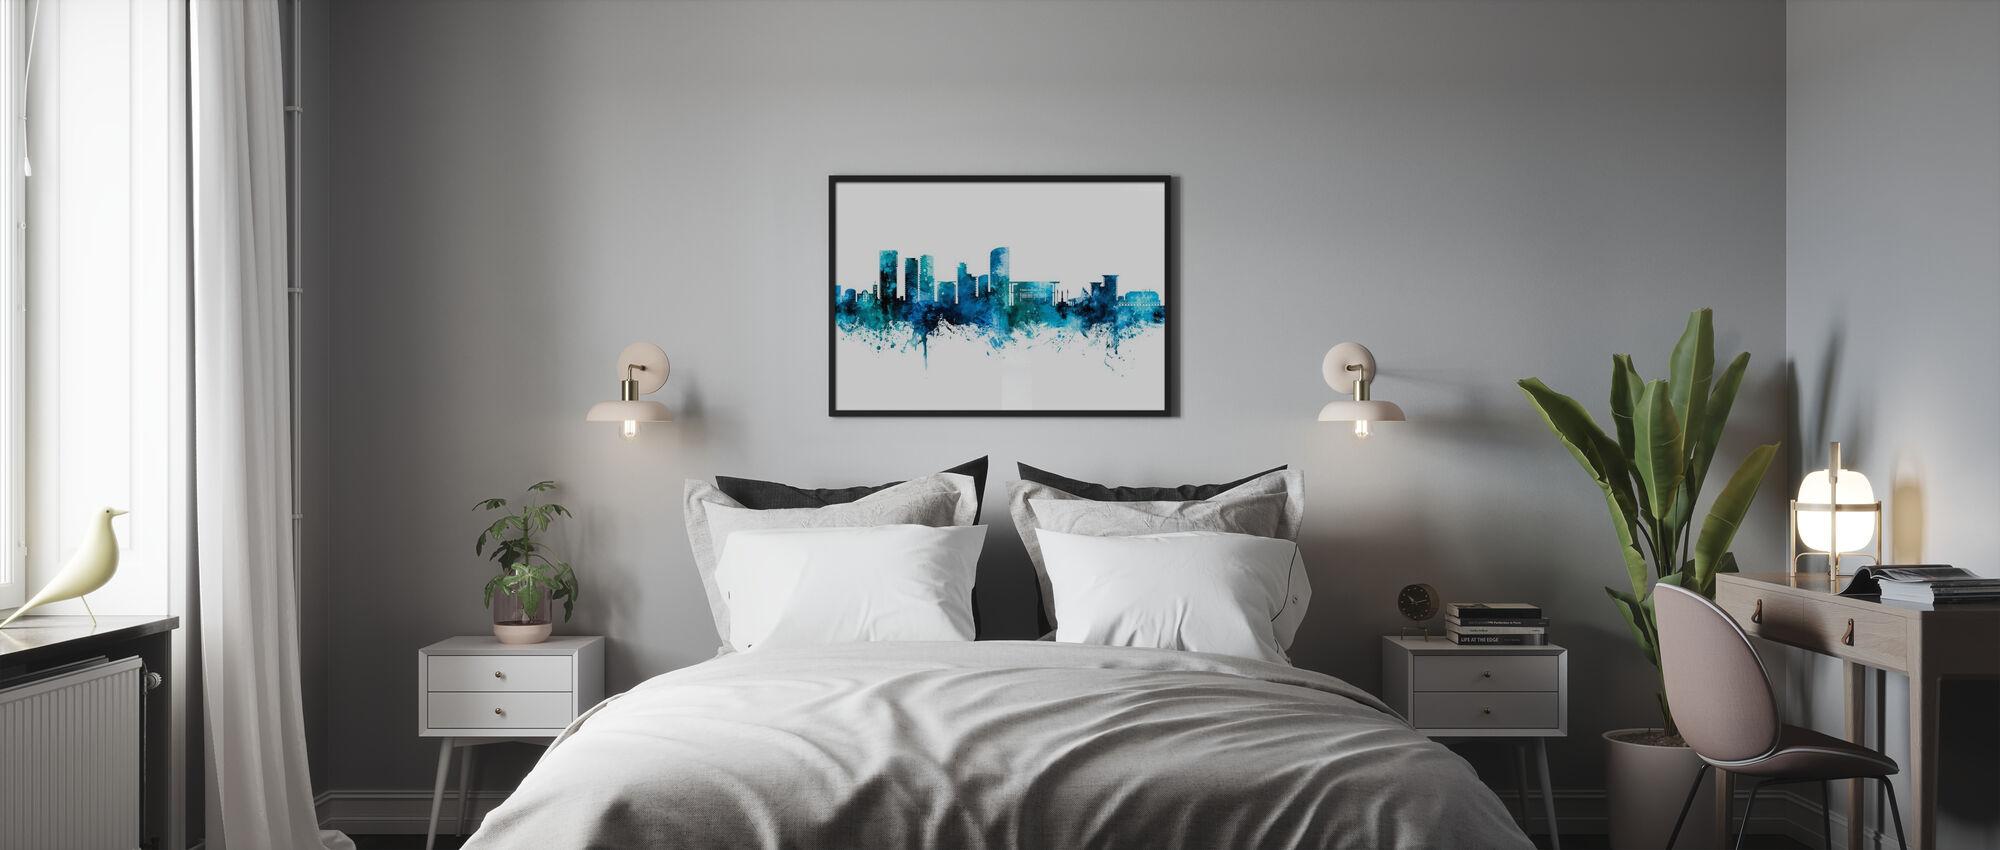 Skyline van Darwin Australië - Poster - Slaapkamer